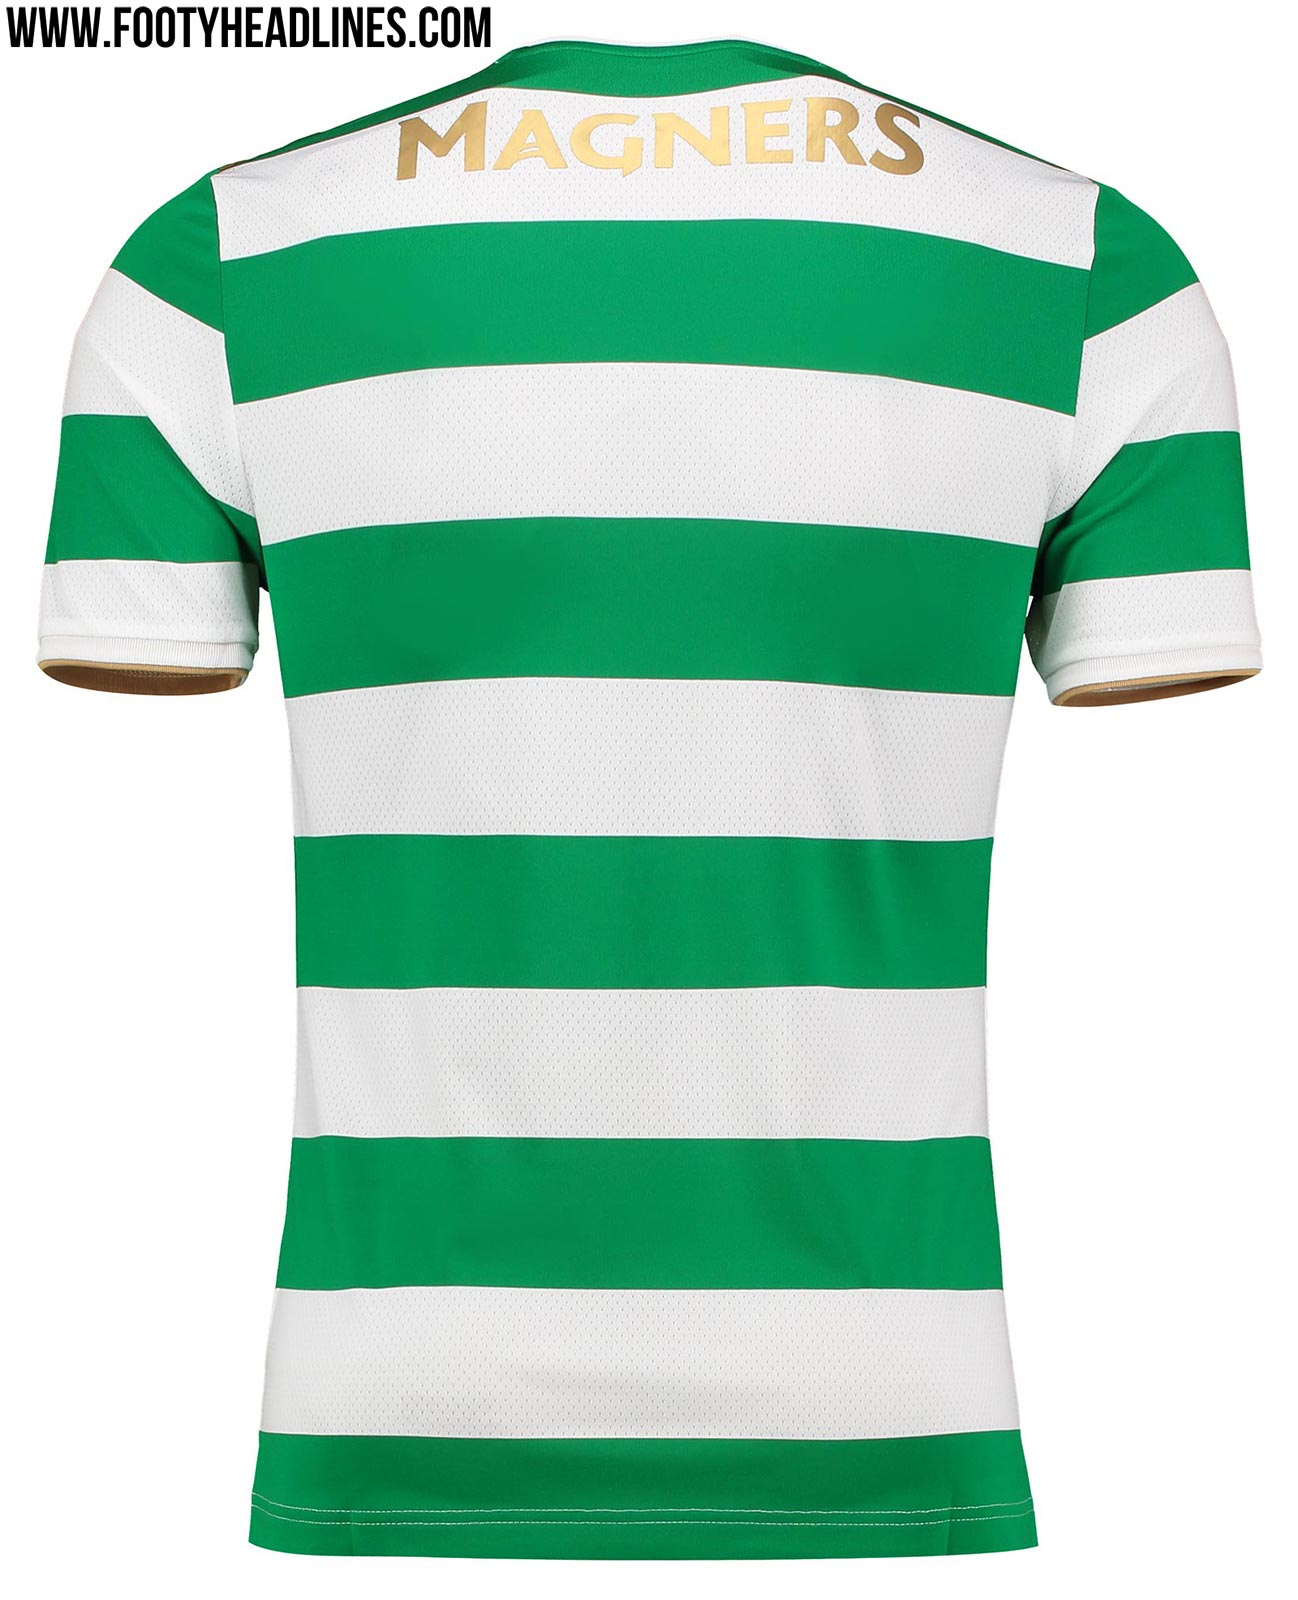 879987e1b 2017 18 Soccer Kits - Page 73 - Sports Logos - Chris Creamer s ...